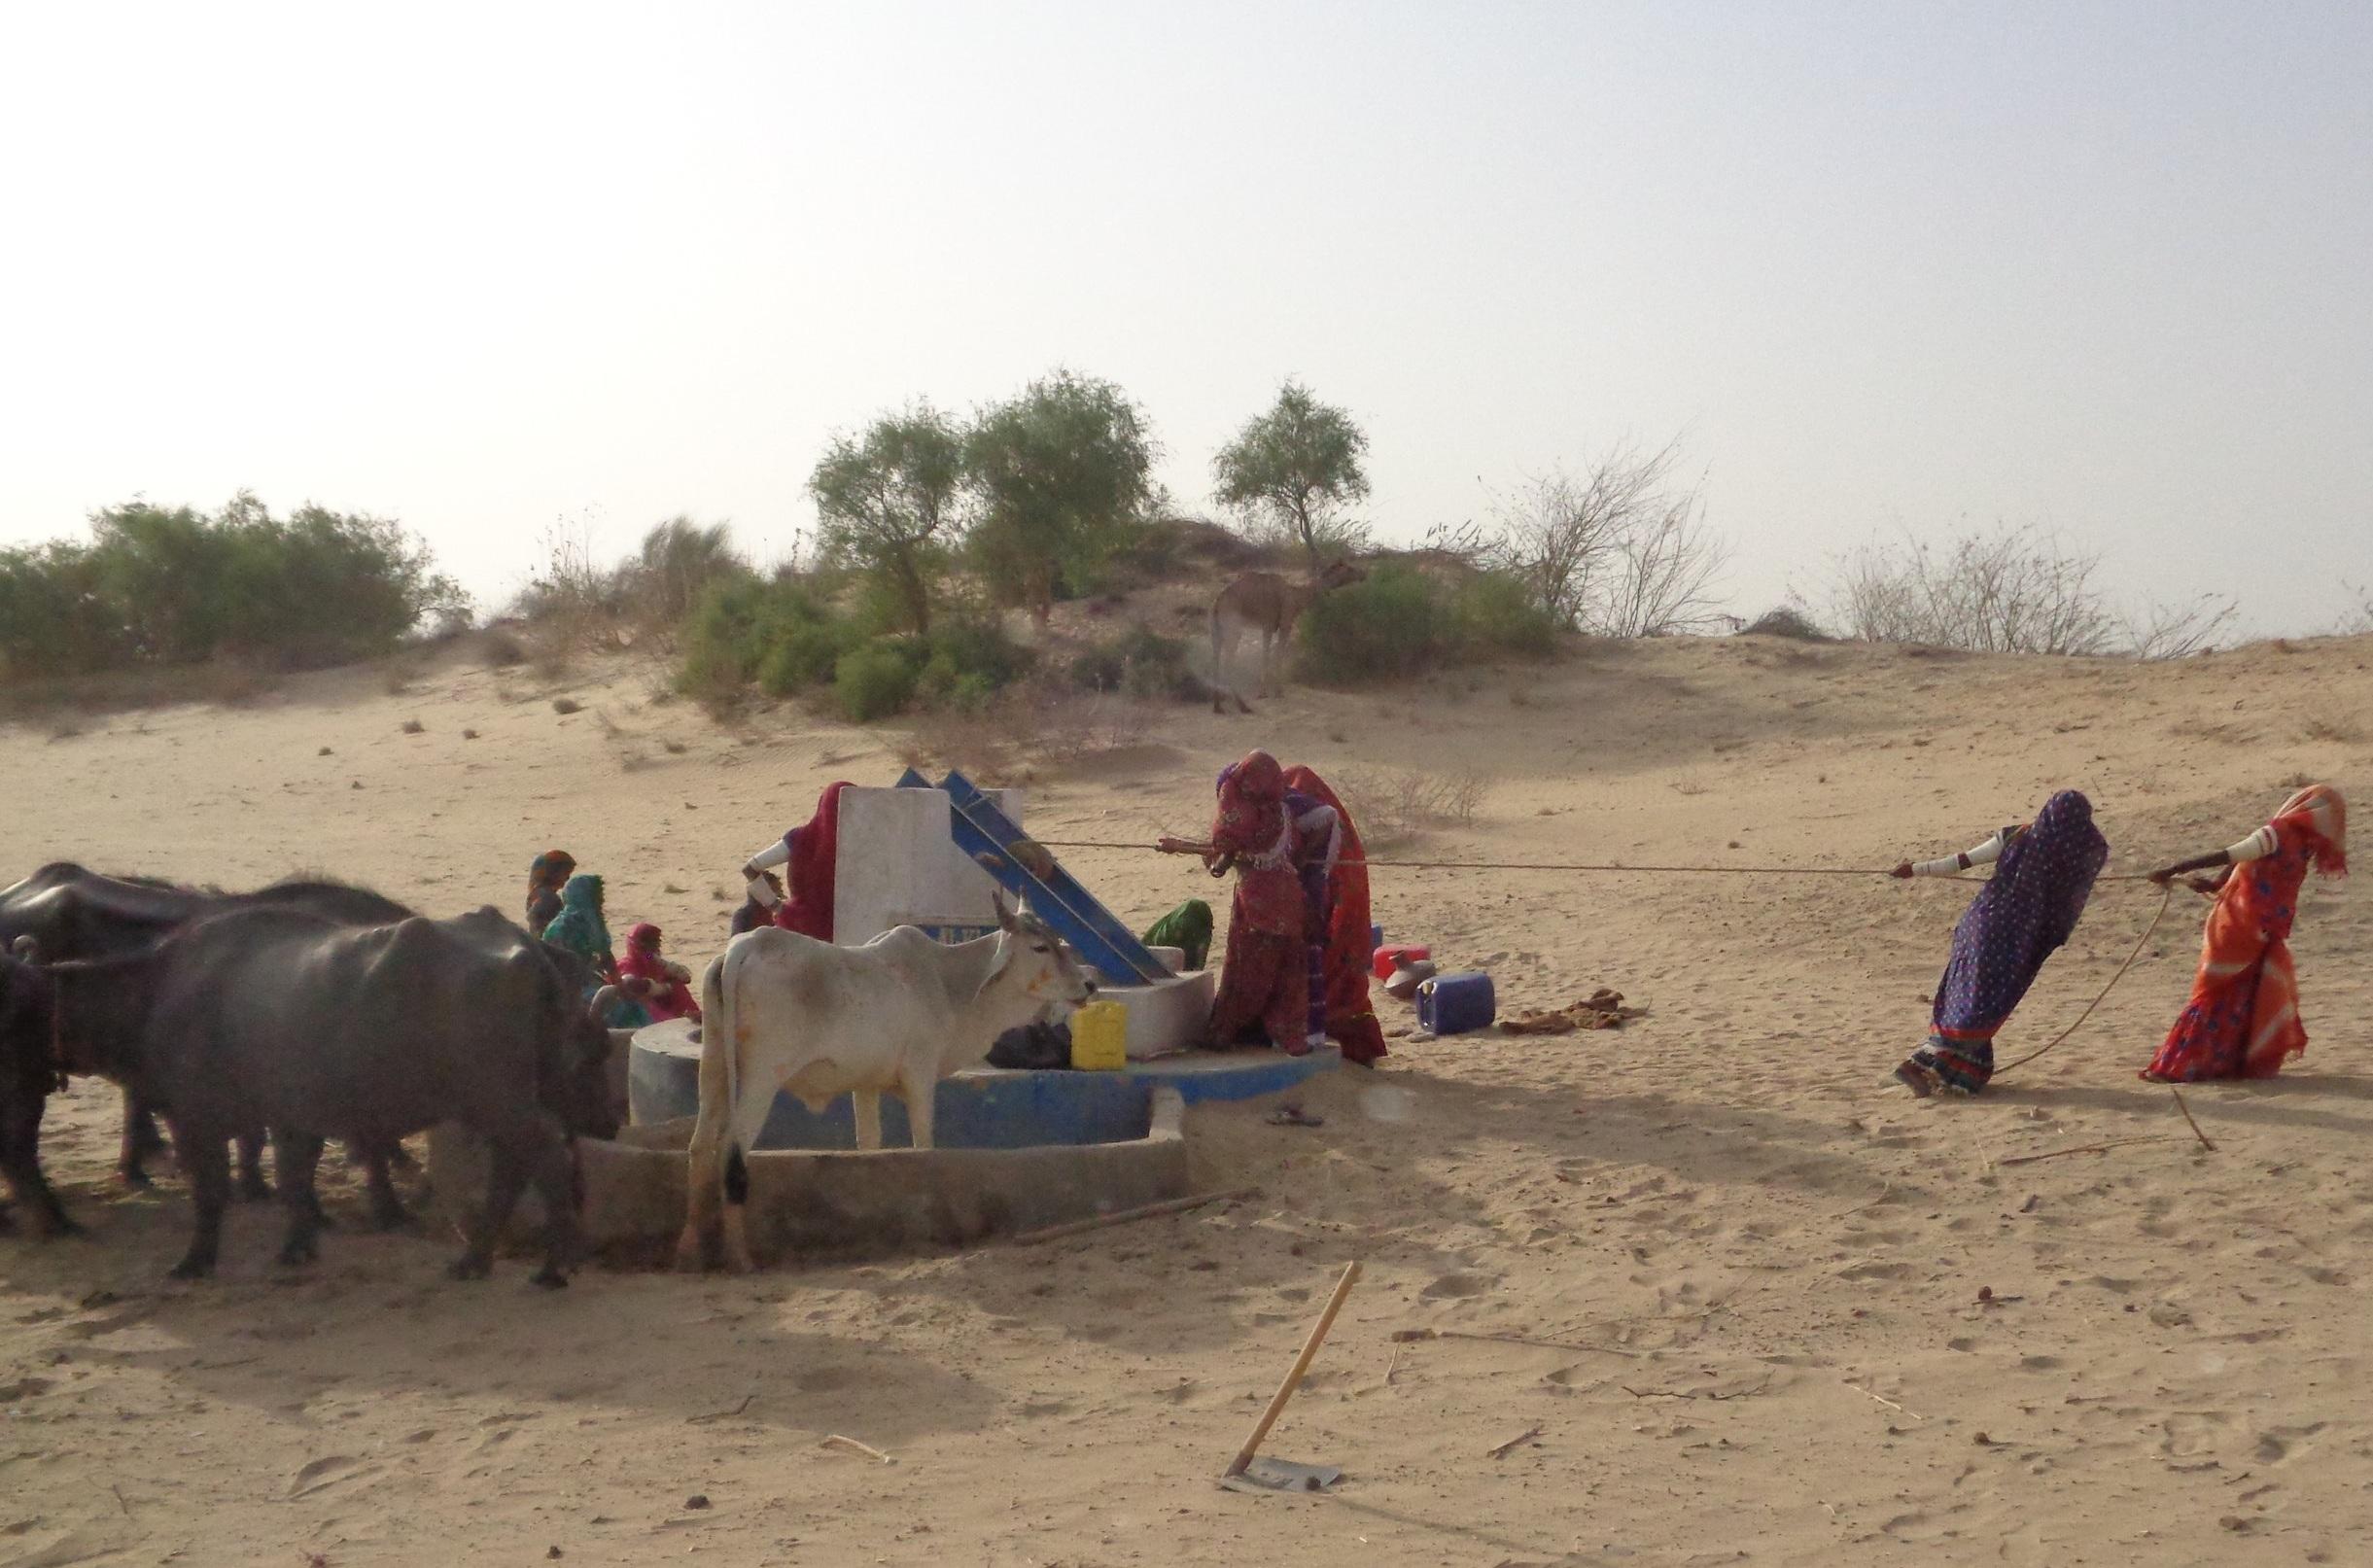 The Goal:$8,036 - Help us raise $8,036 to build a solar water pump in the village of Dabho Bheel, Tharparkar Pakistan.